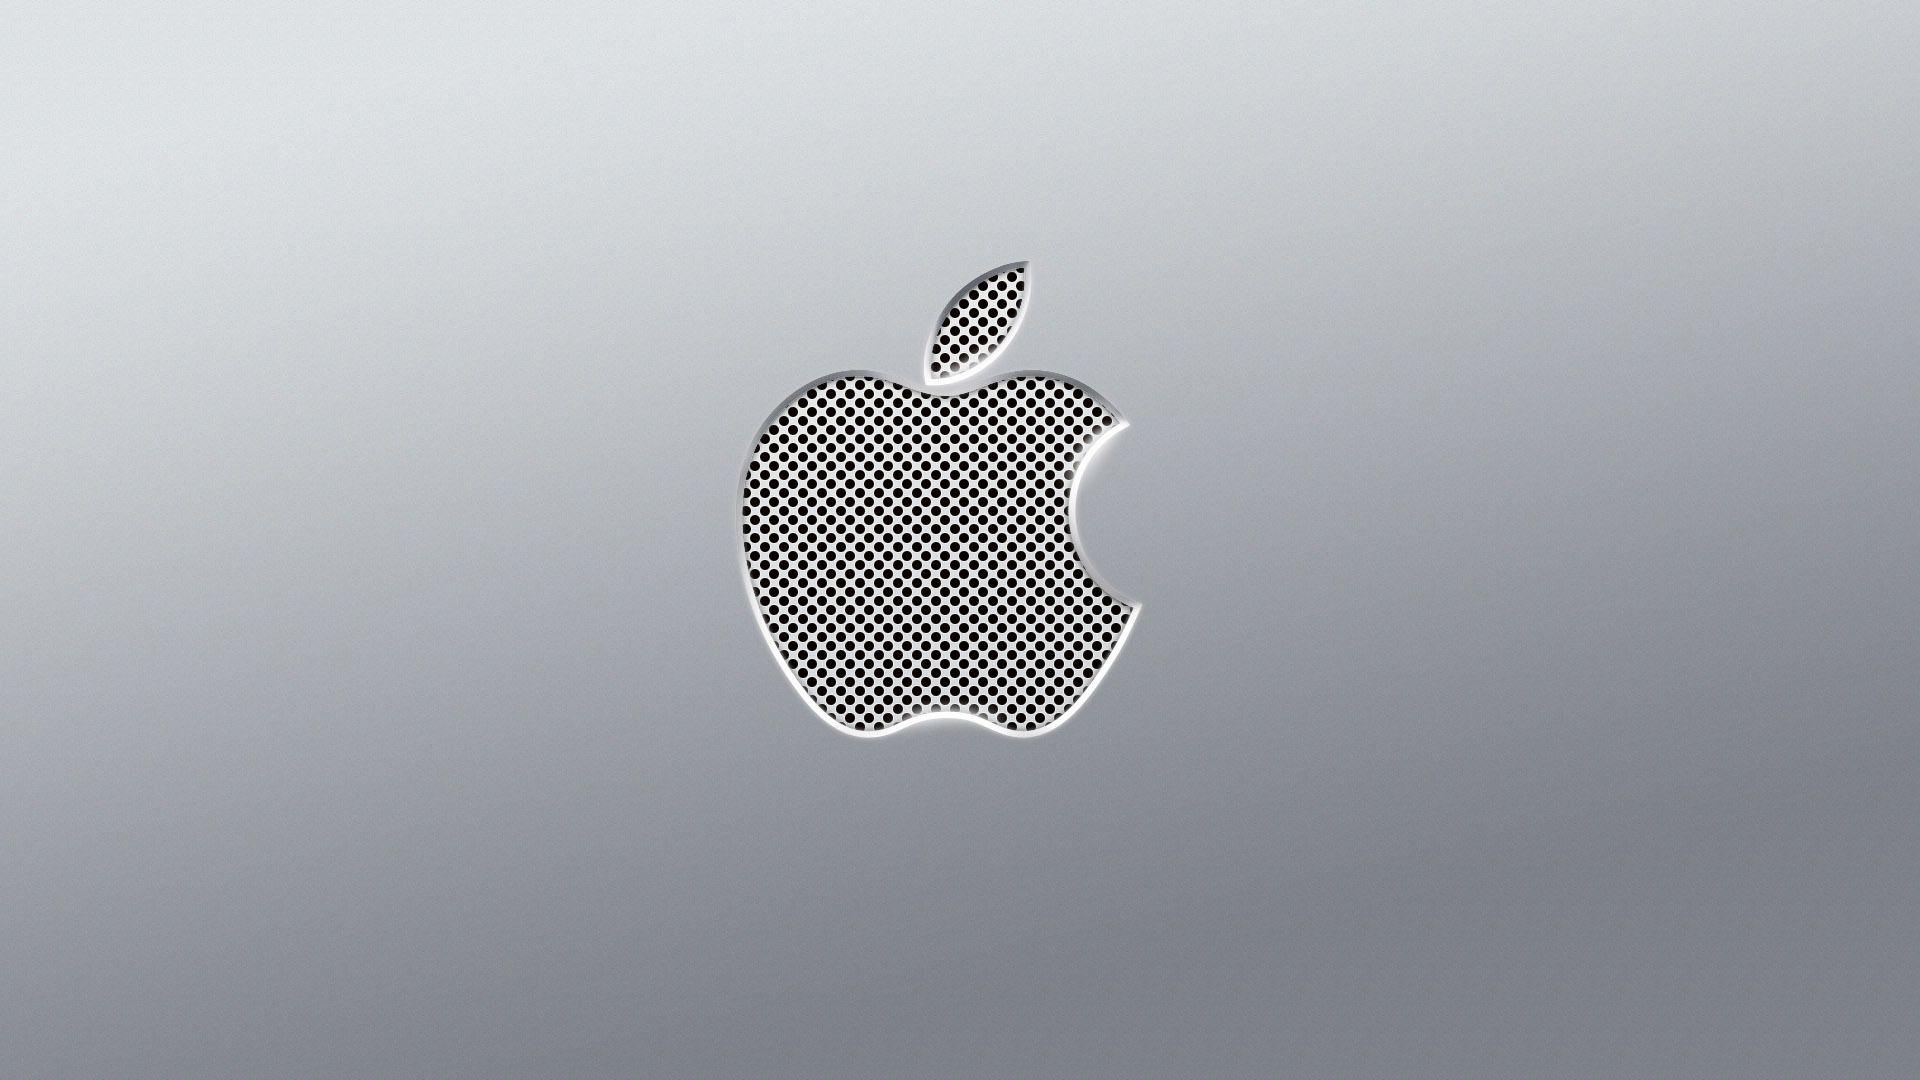 Logo Iphone Apple Wallpaper